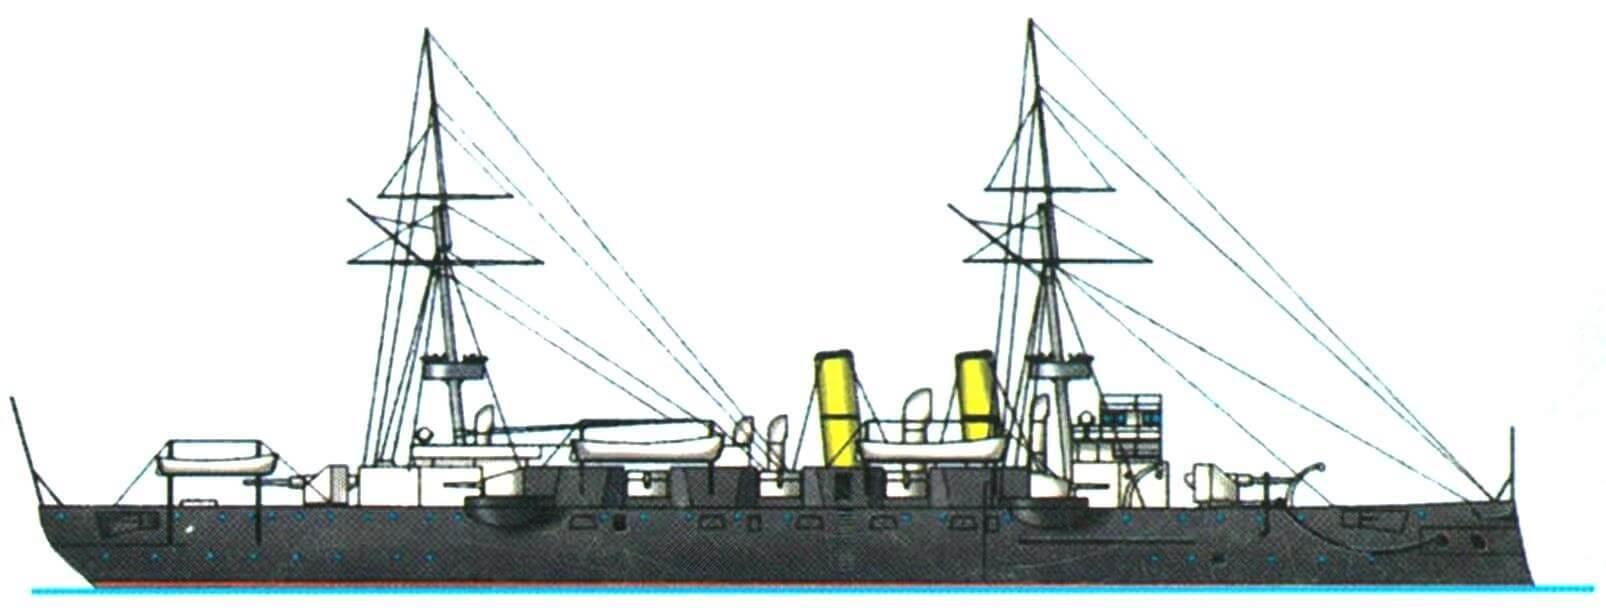 Броненосный крейсер «Австралия» (Англия, 1888 г.)